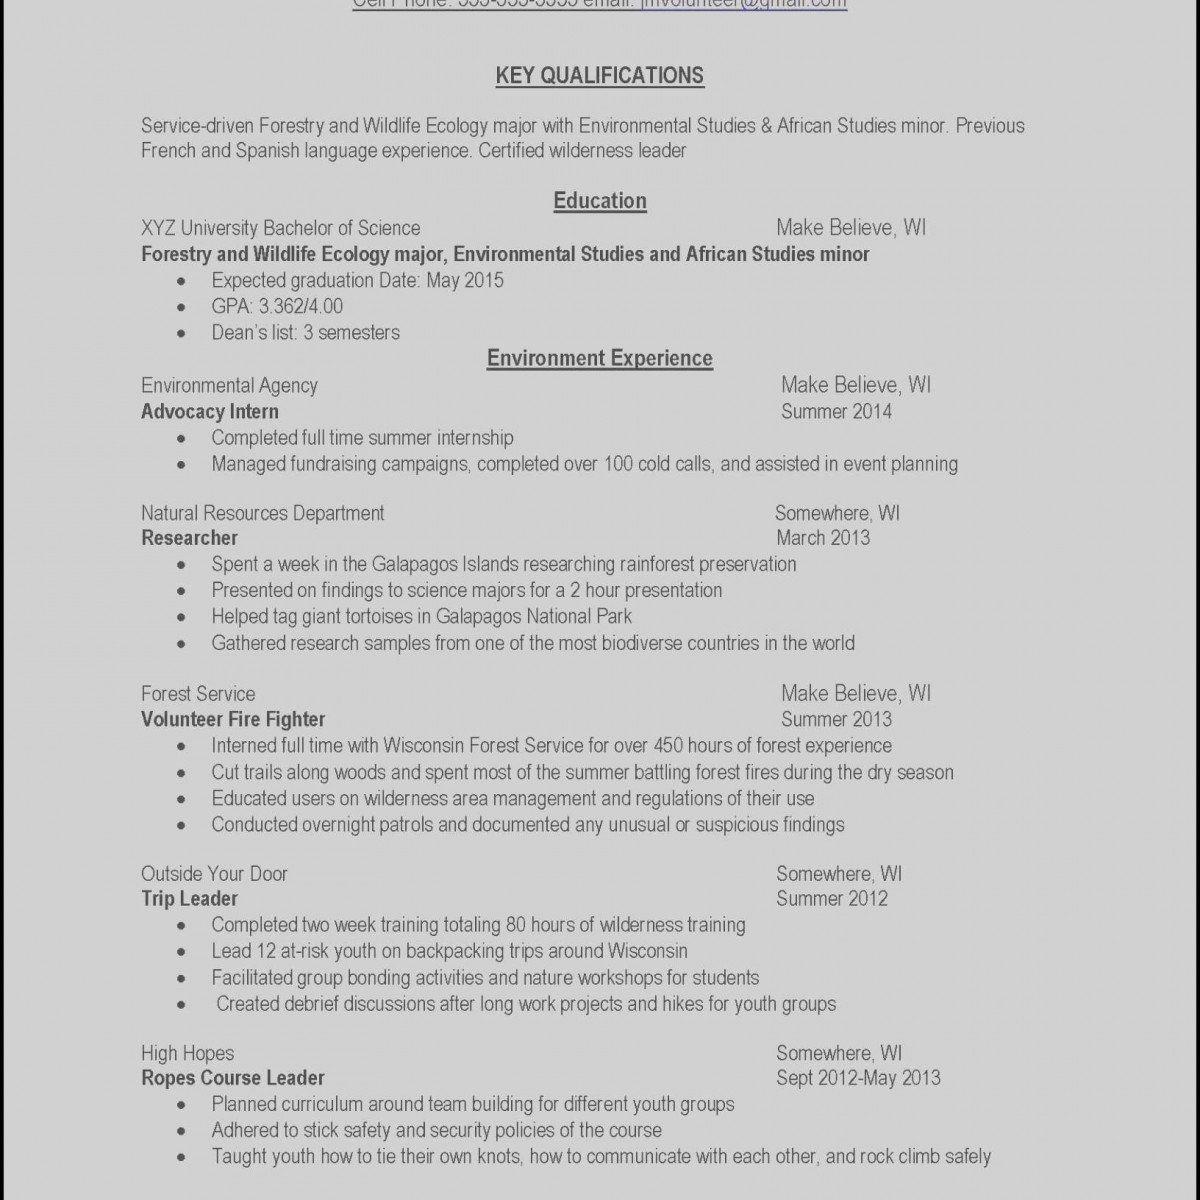 Anticipated Graduation Date Resume Inspirational How To Write Expected Graduation Date Resume Job Resume Examples Teacher Resume Template